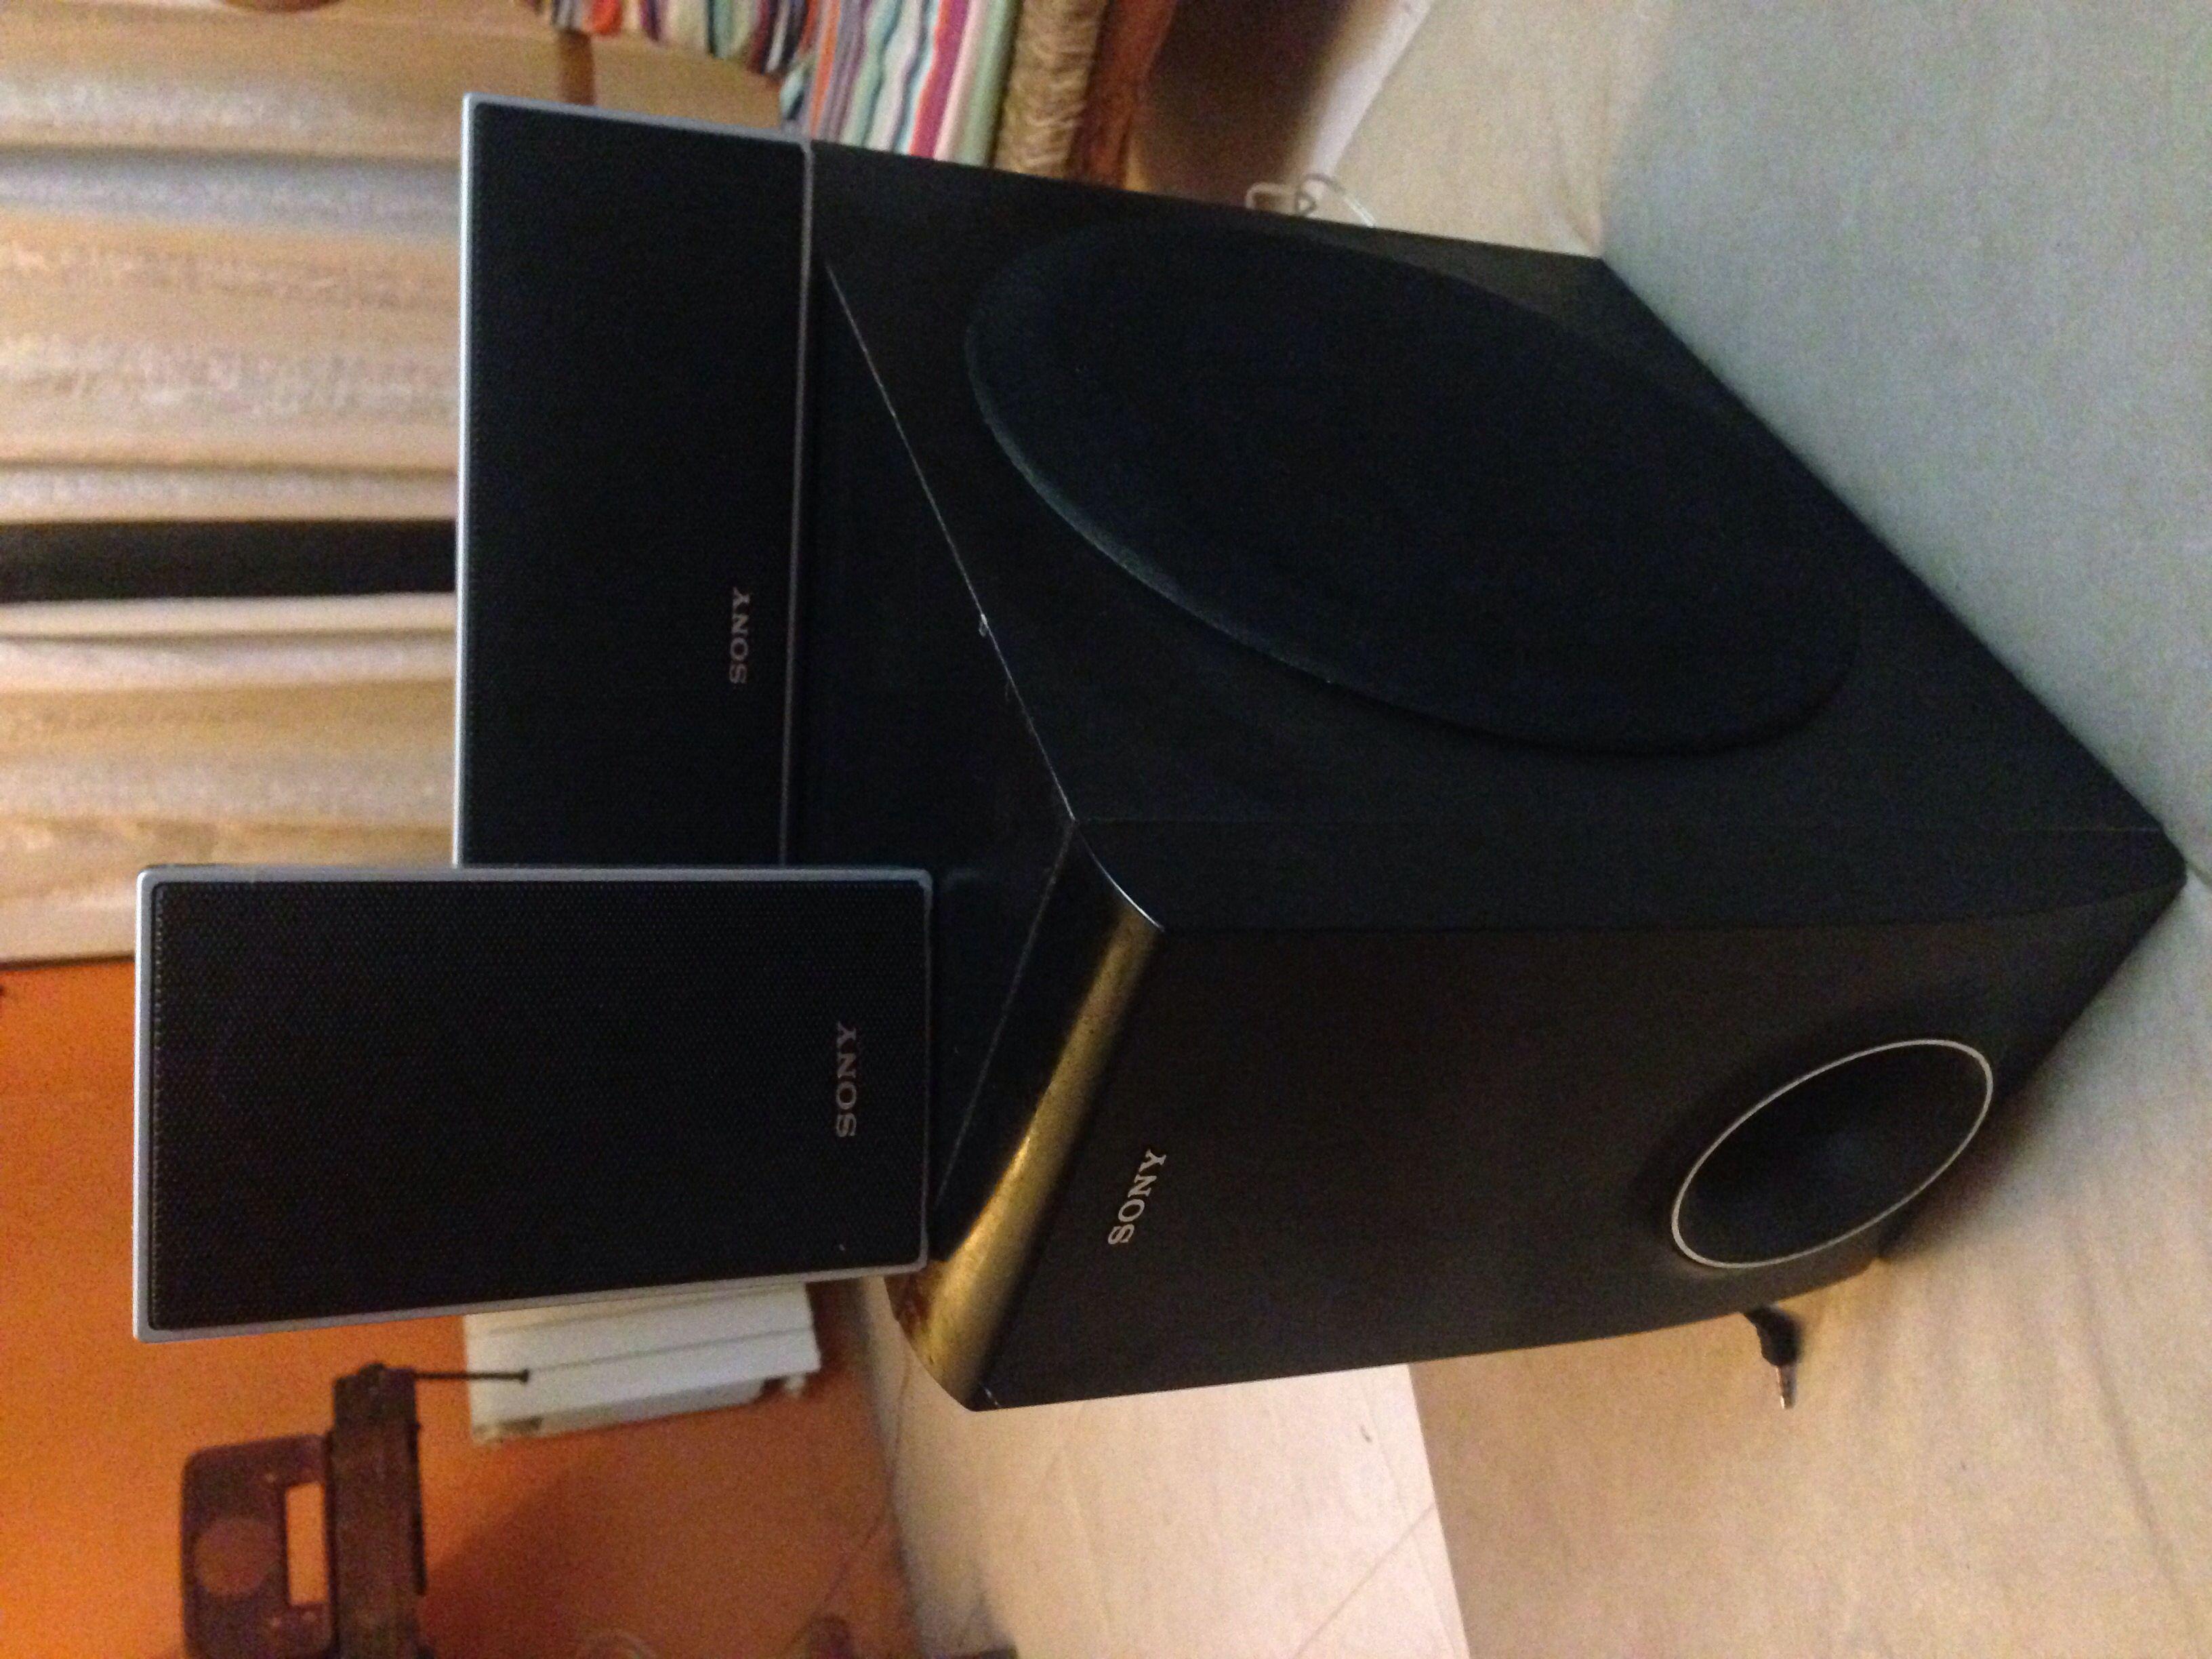 Juego de parlantes Sony 4 chiquitos 1 frontal y subwoofer $ 1800